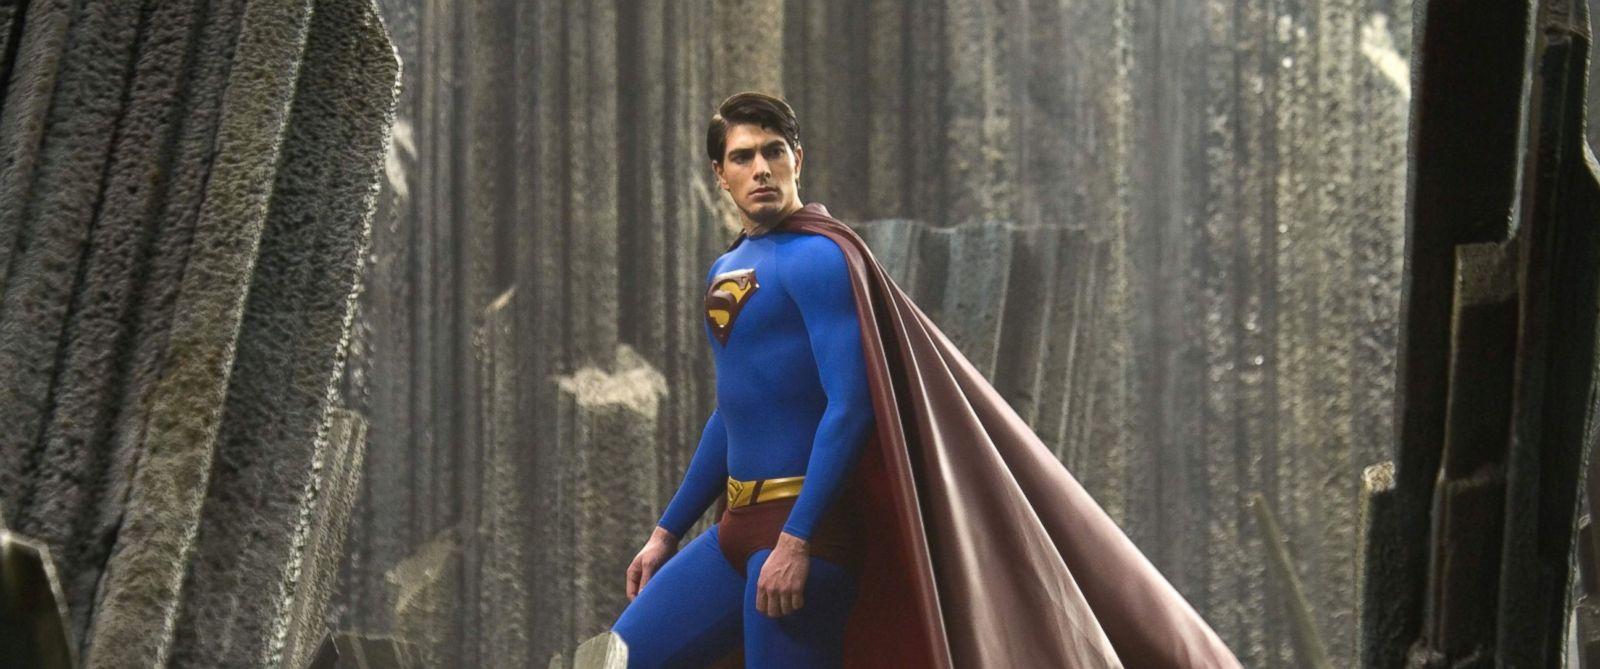 'Batman v Superman': What Happened to Brandon Routh - ABC News